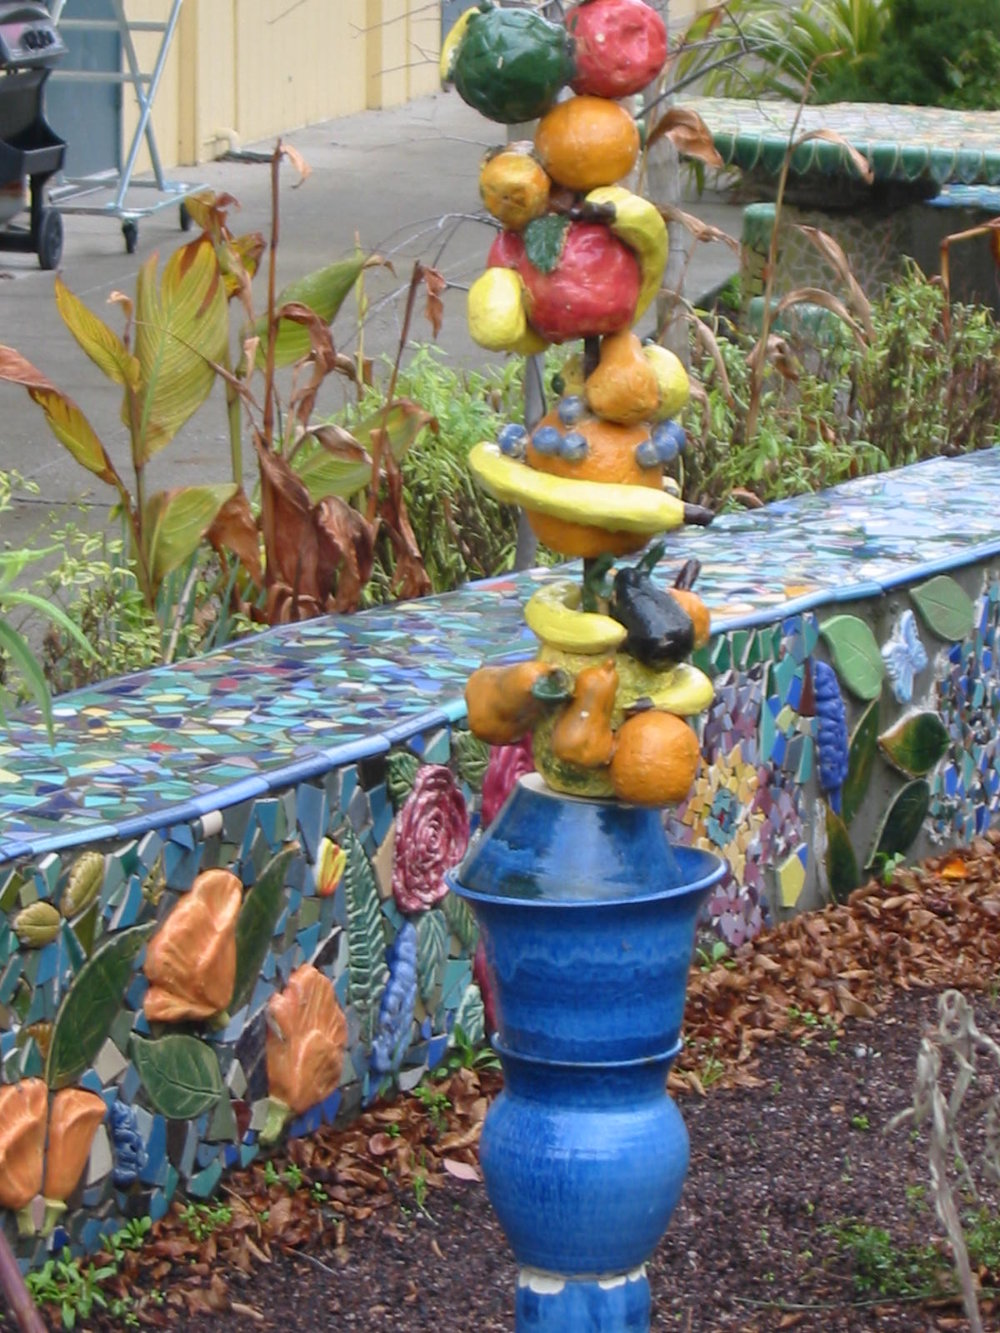 sculpture in the Art Garden